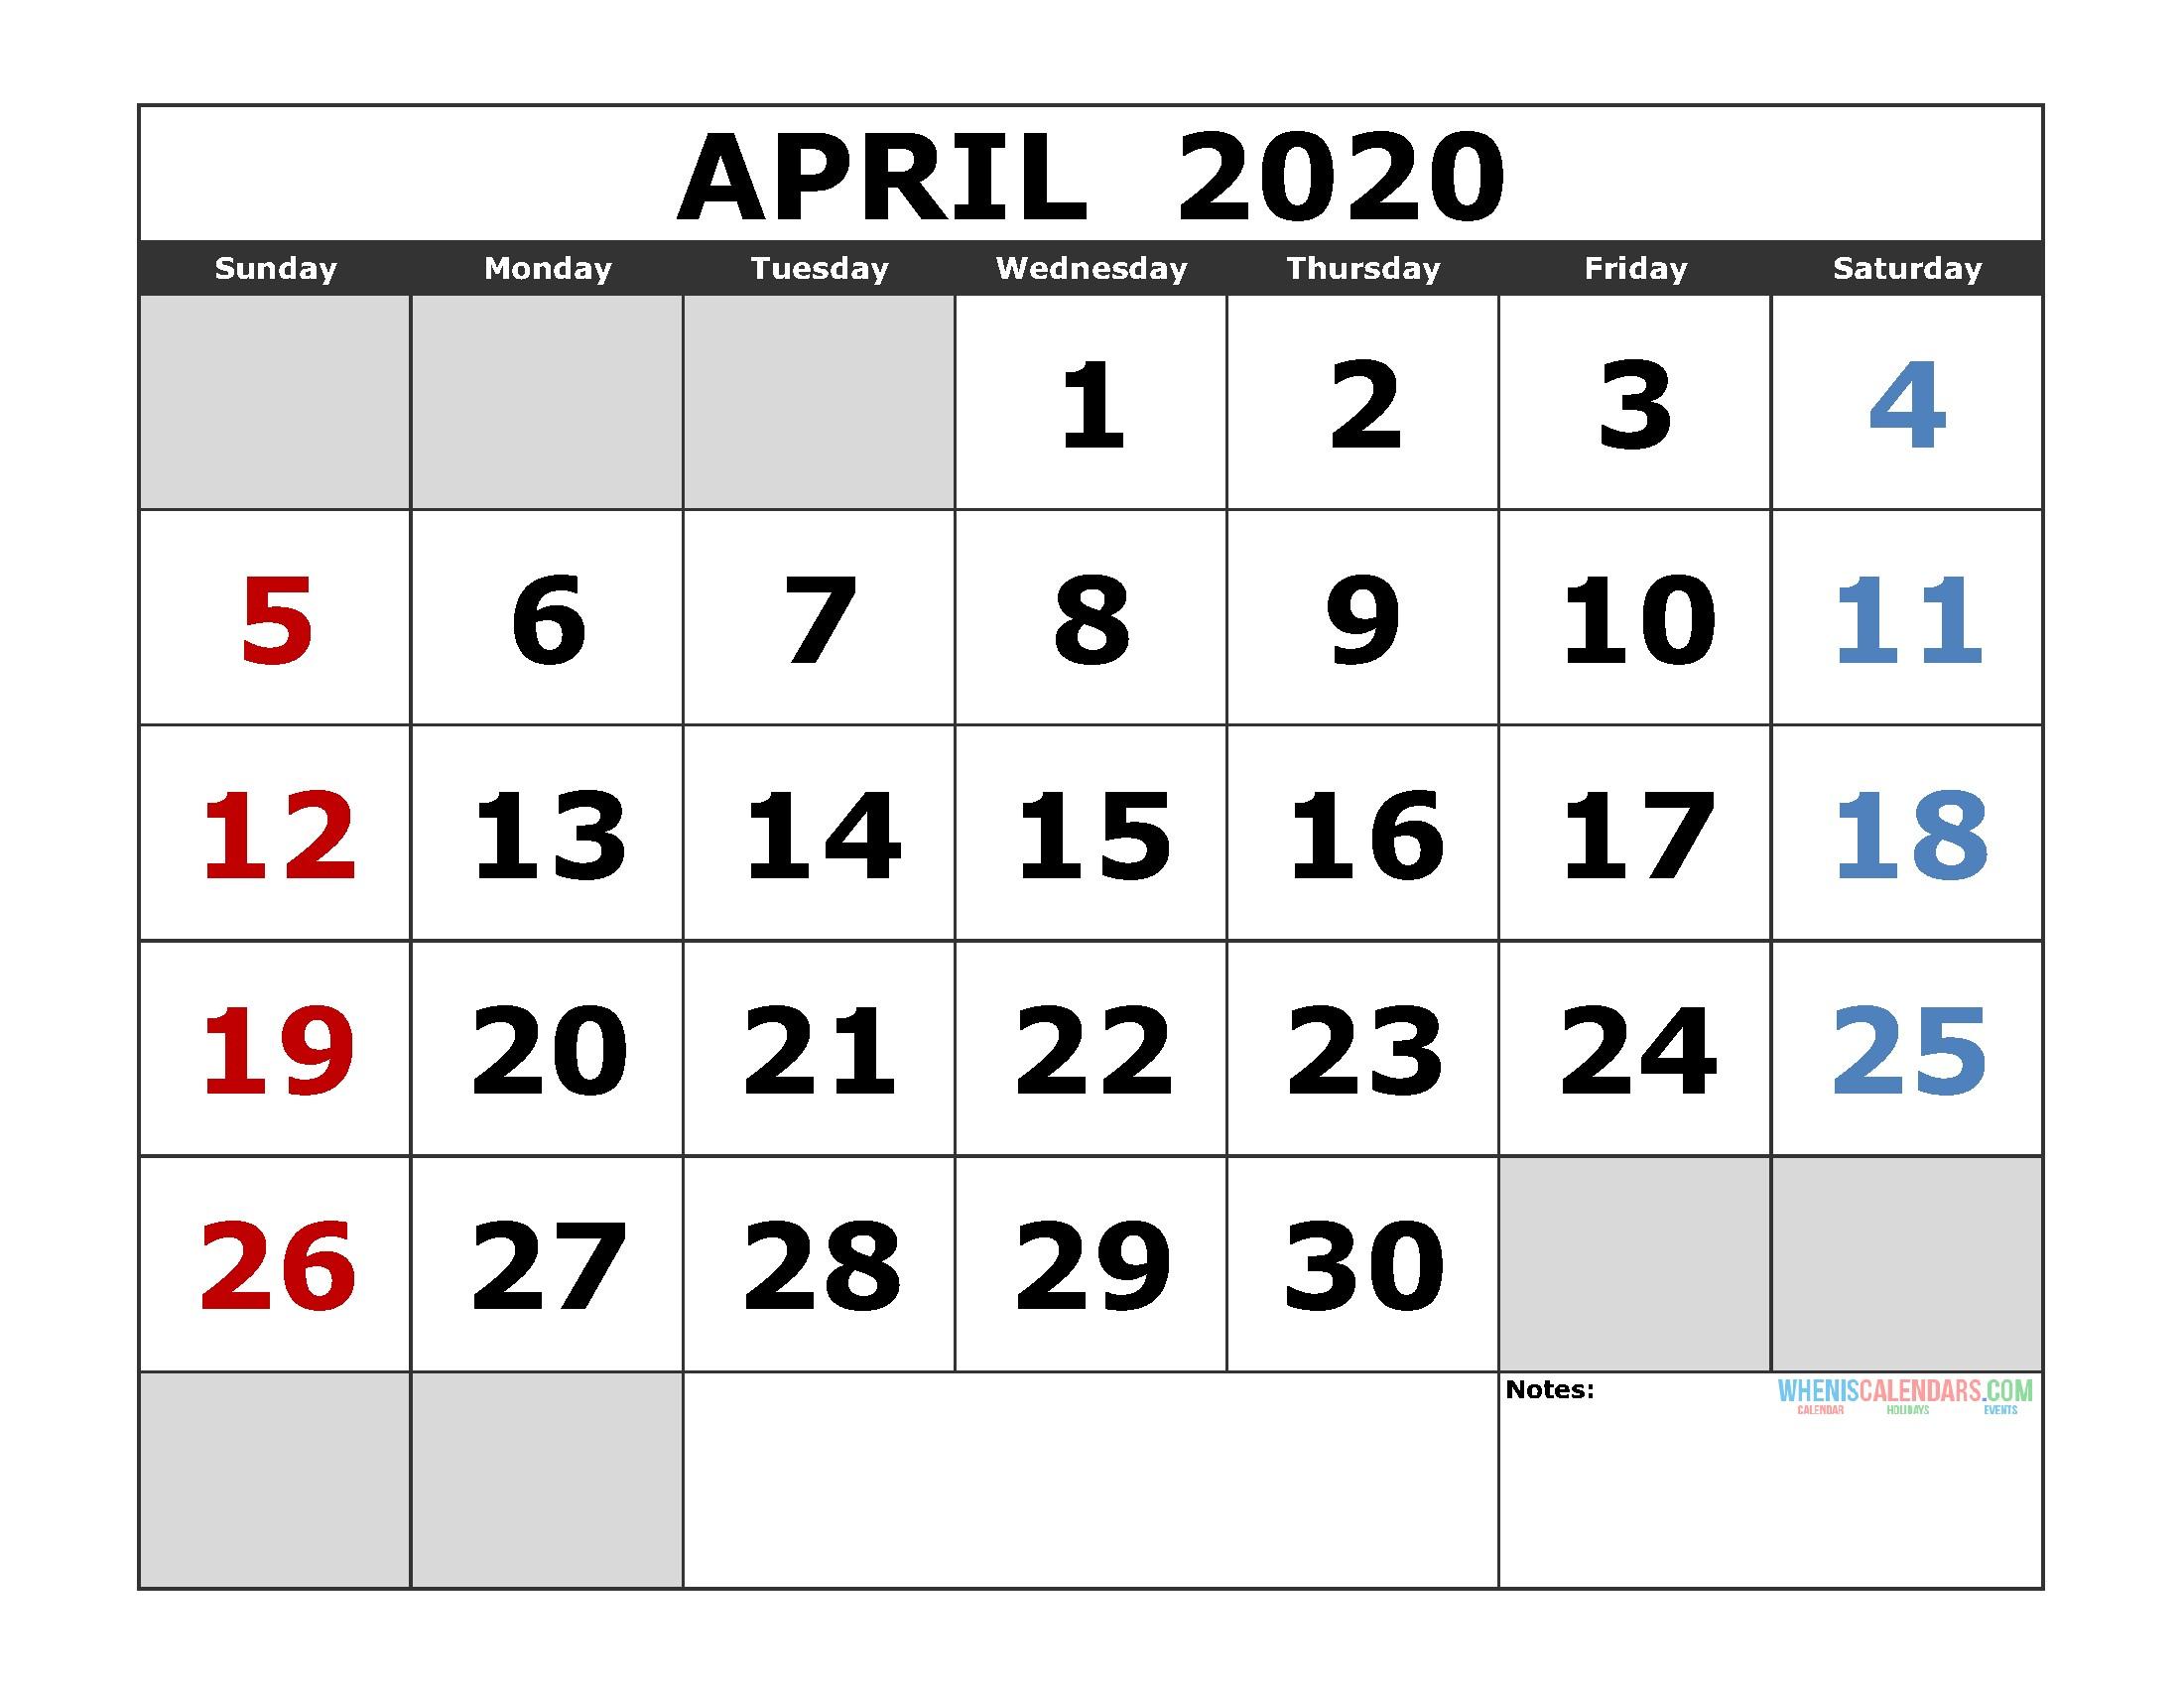 Free Printable Calendar January 2020 April 2020 Printable Calendar Template Excel Pdf Image